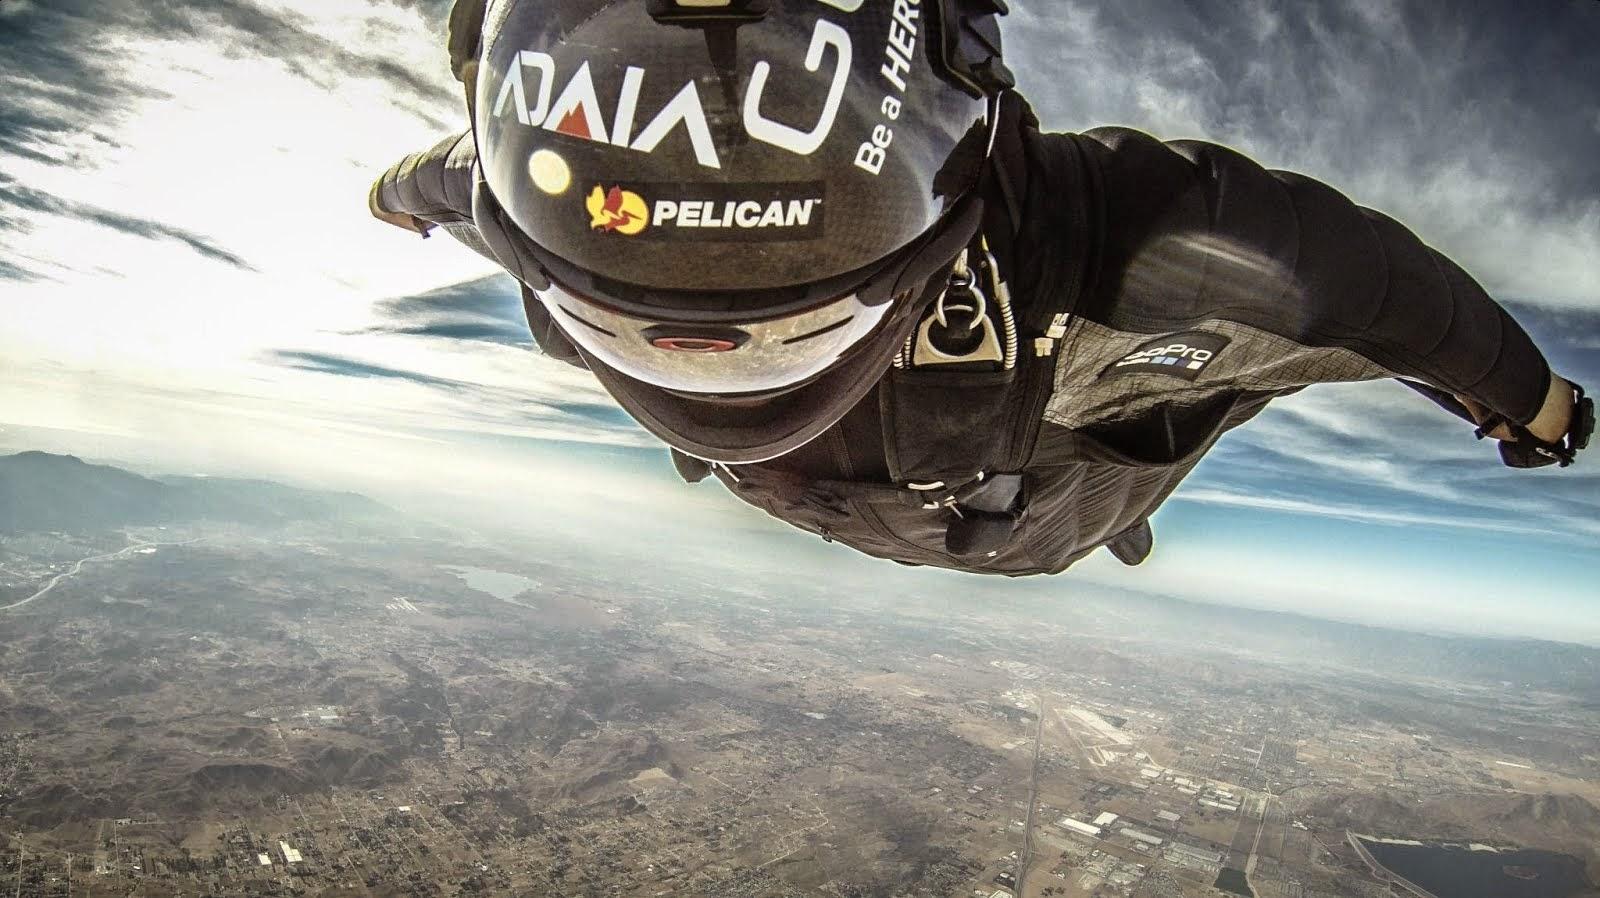 翼裝飛行運動(Wingsuit flying)Taiwan